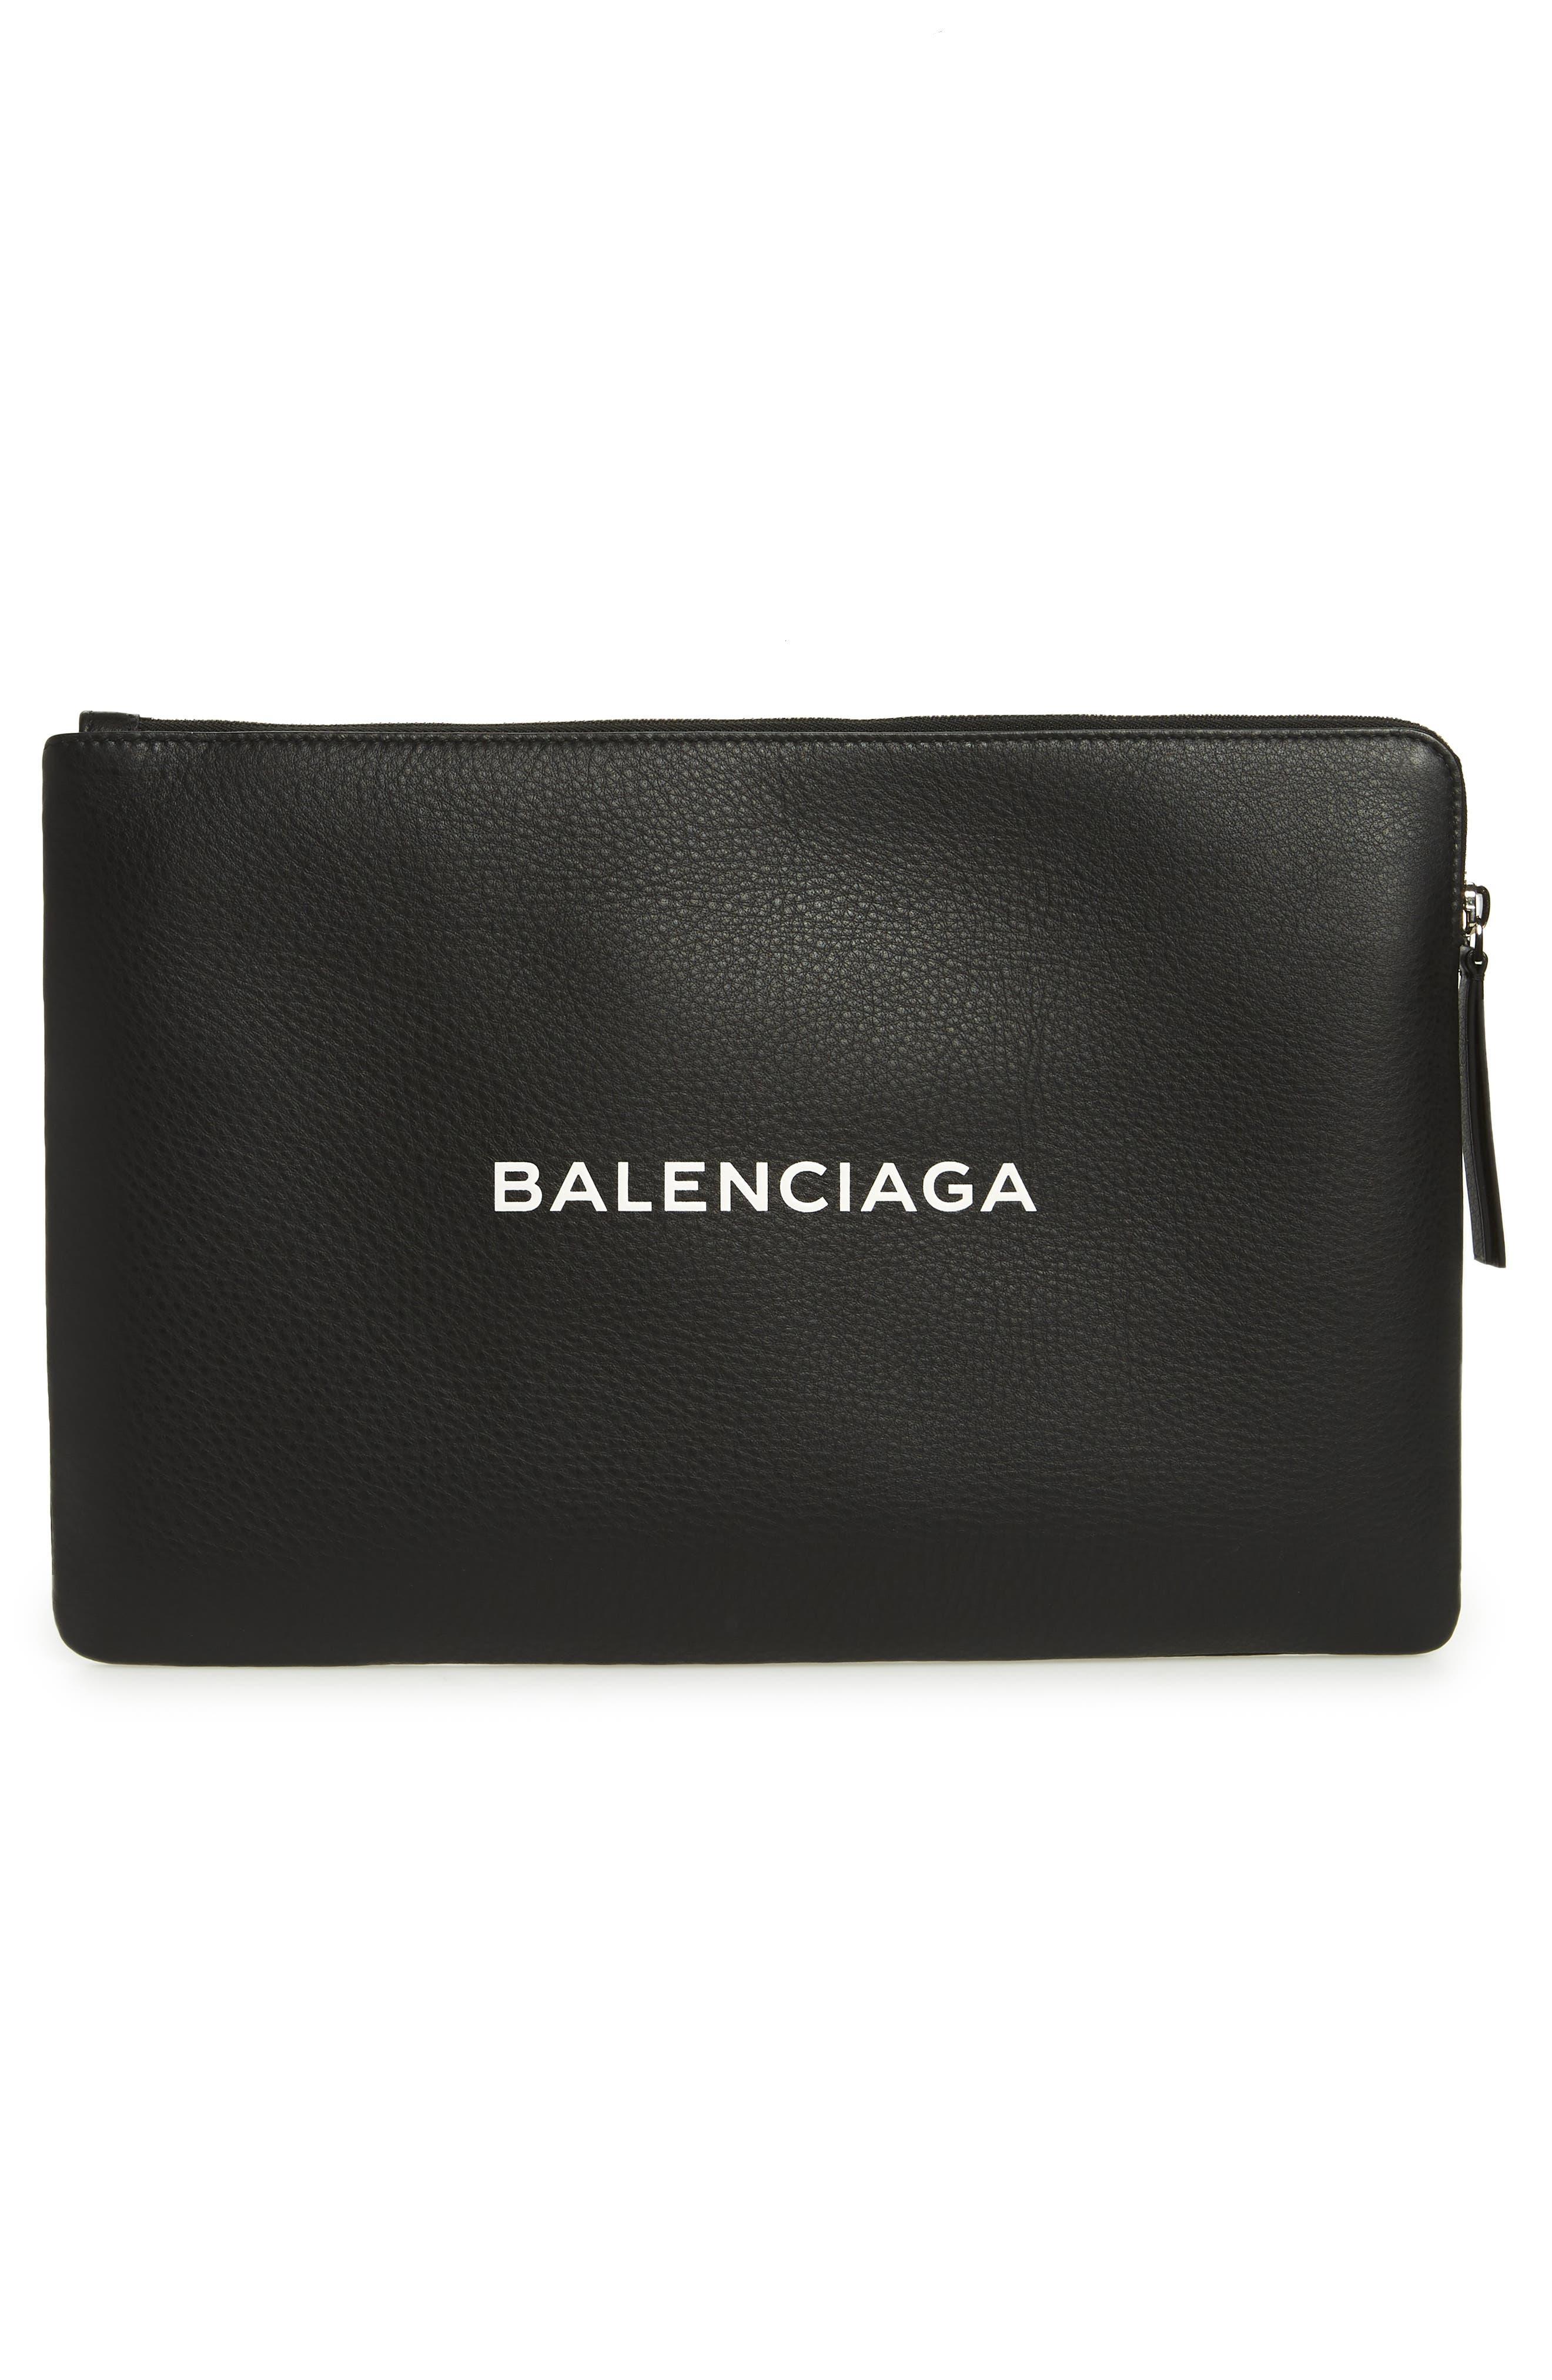 Balencia Large Everyday Leather Pouch,                             Alternate thumbnail 3, color,                             NOIR/ BLANC